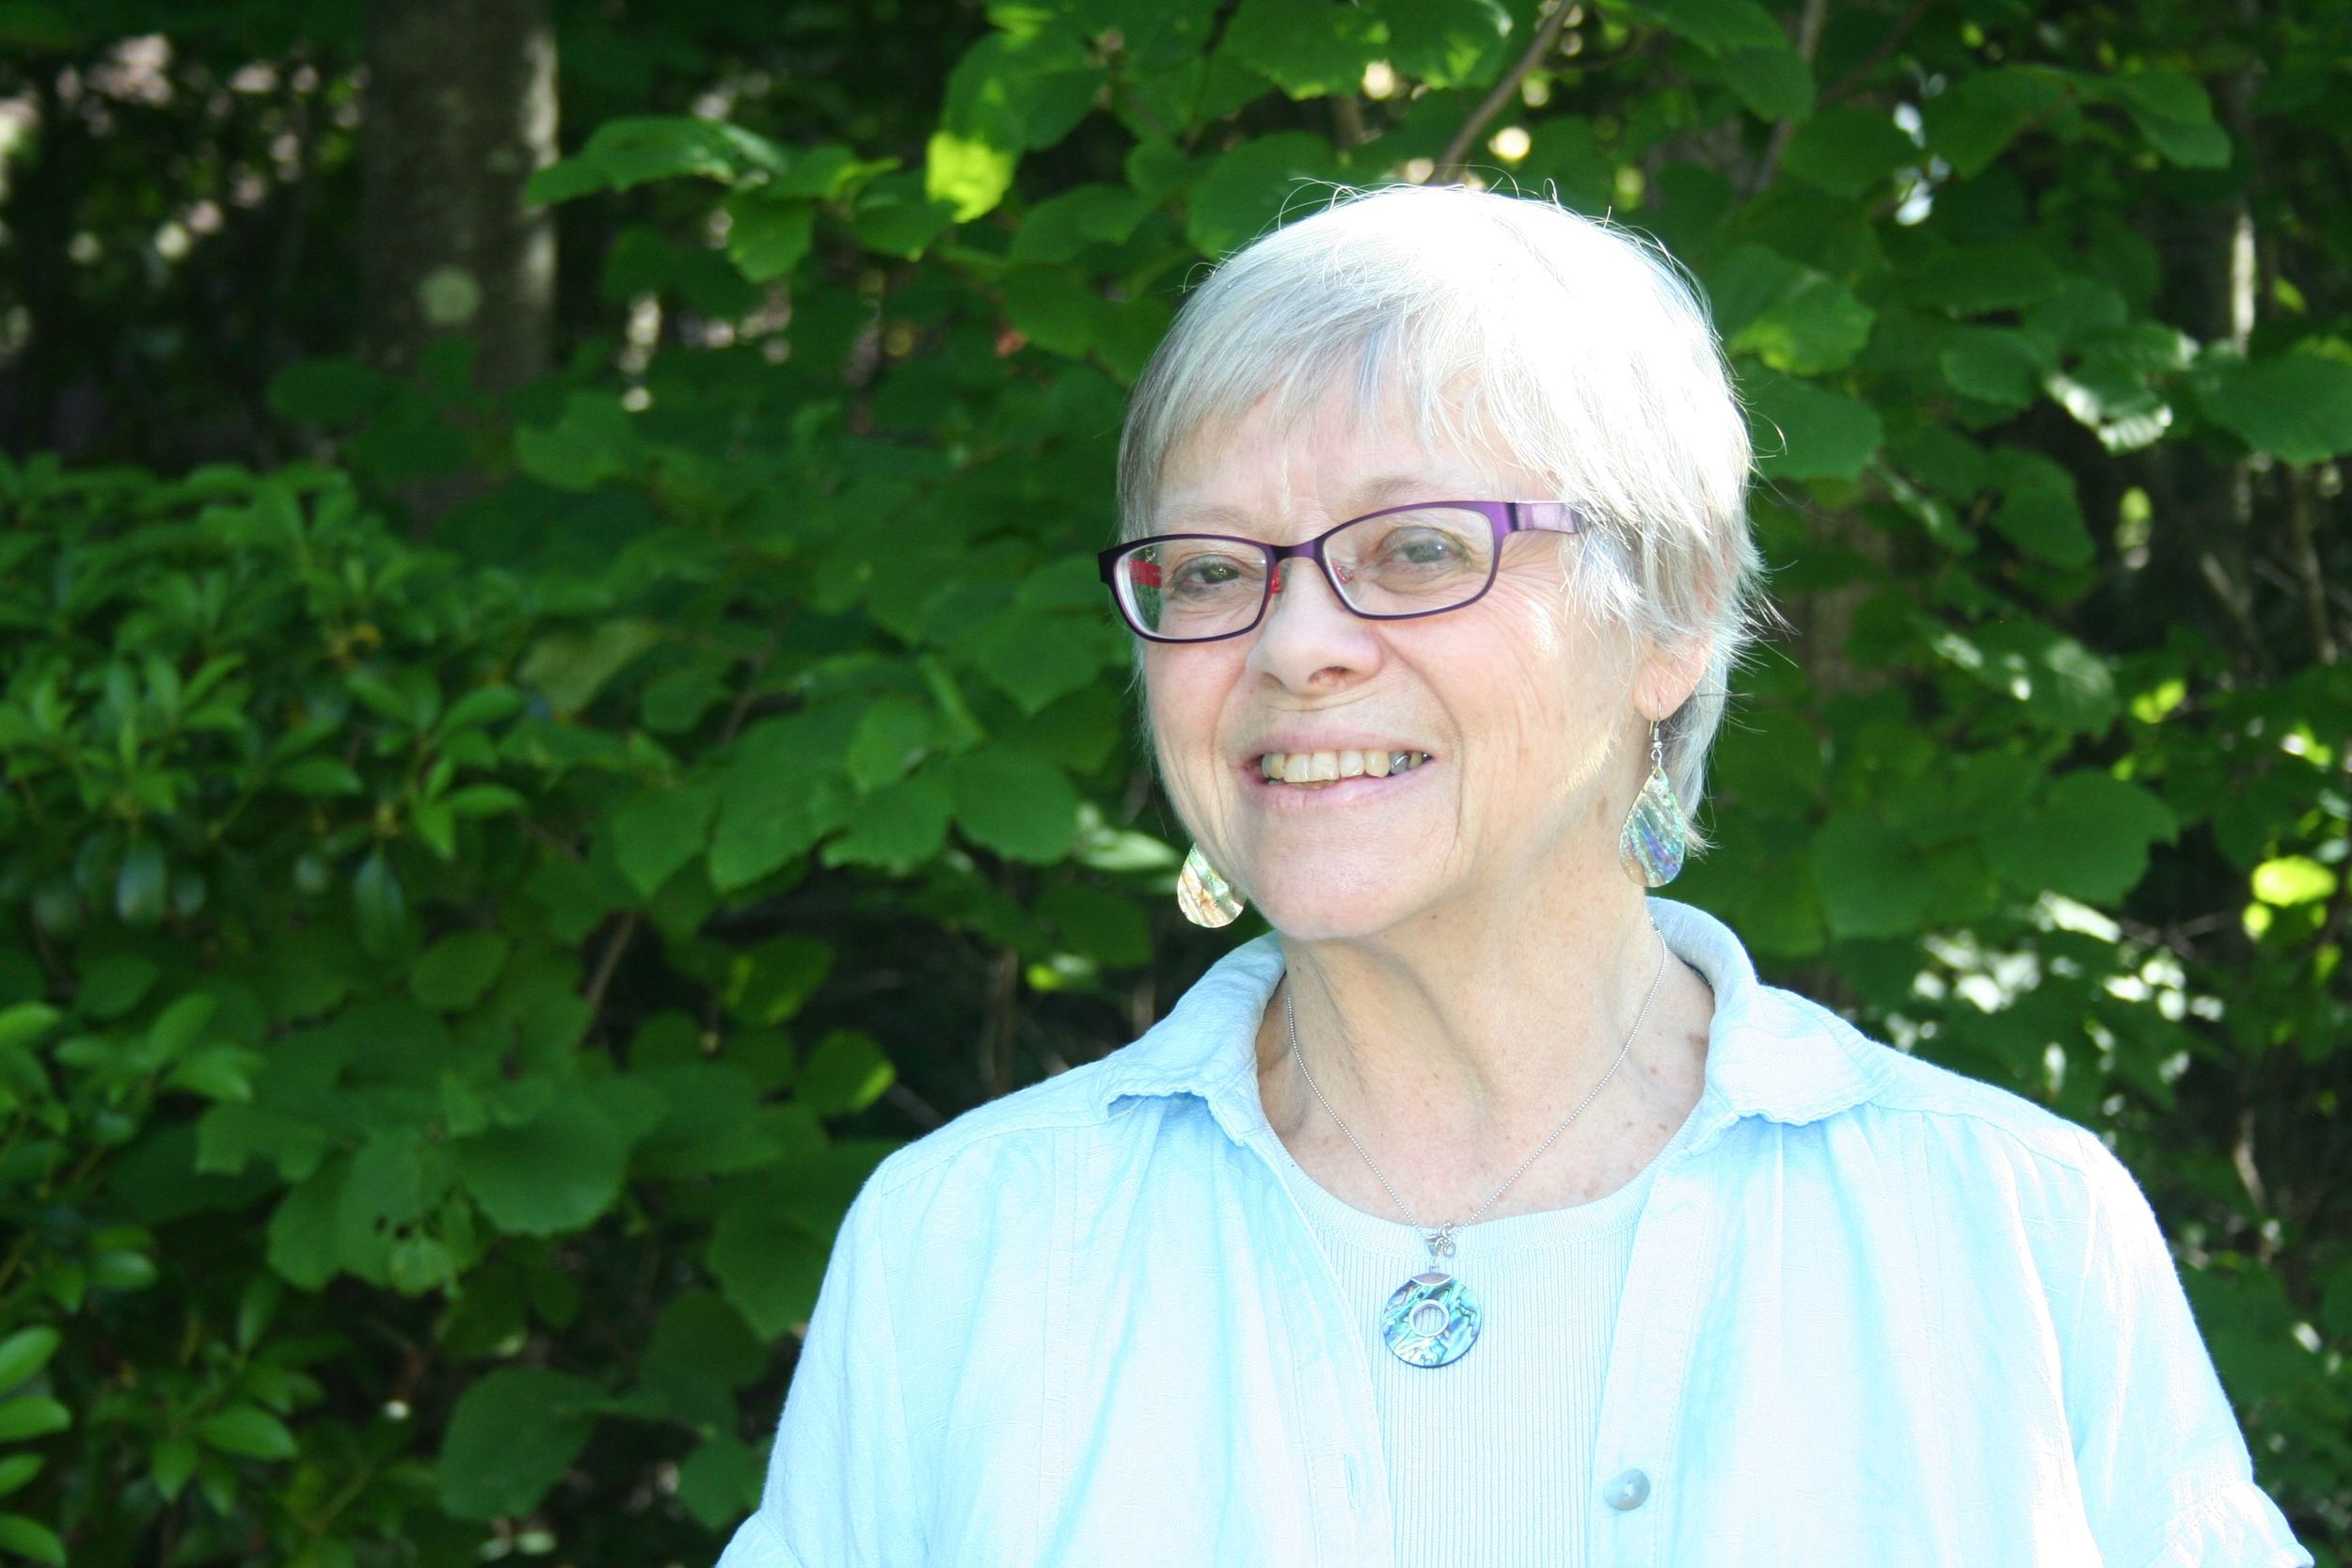 Photo of Carol Rinehart by Kat Allen